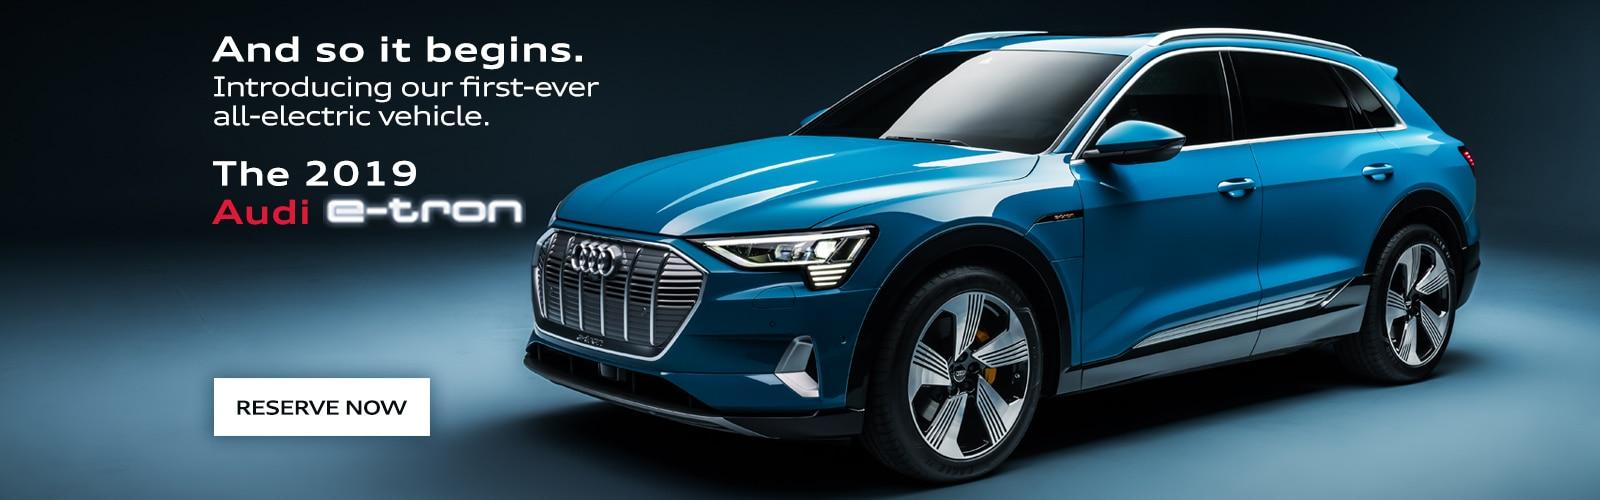 Audi Coral Springs New Audi Dealership In Coral Springs FL - Audi dealers florida